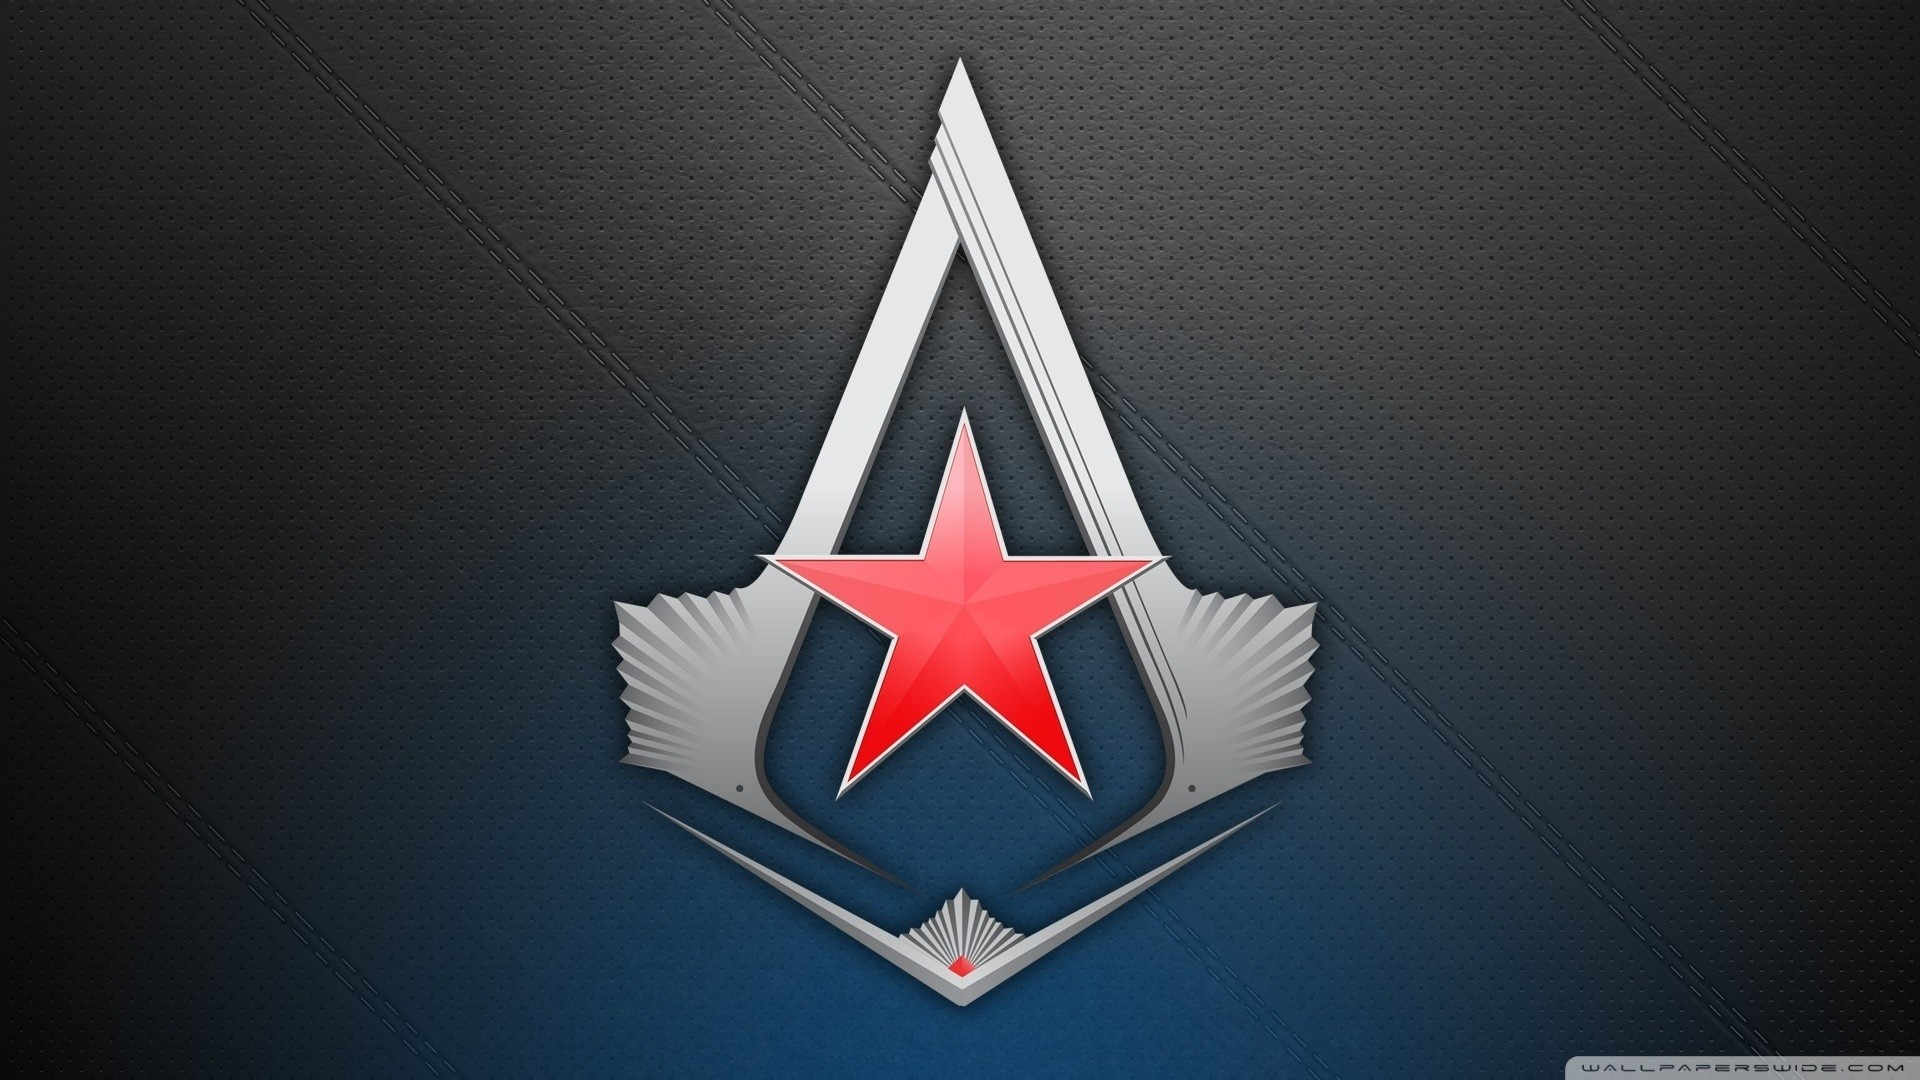 Assassins Creed Logo 2 Wallpaper Assassins, Creed, Logo, …